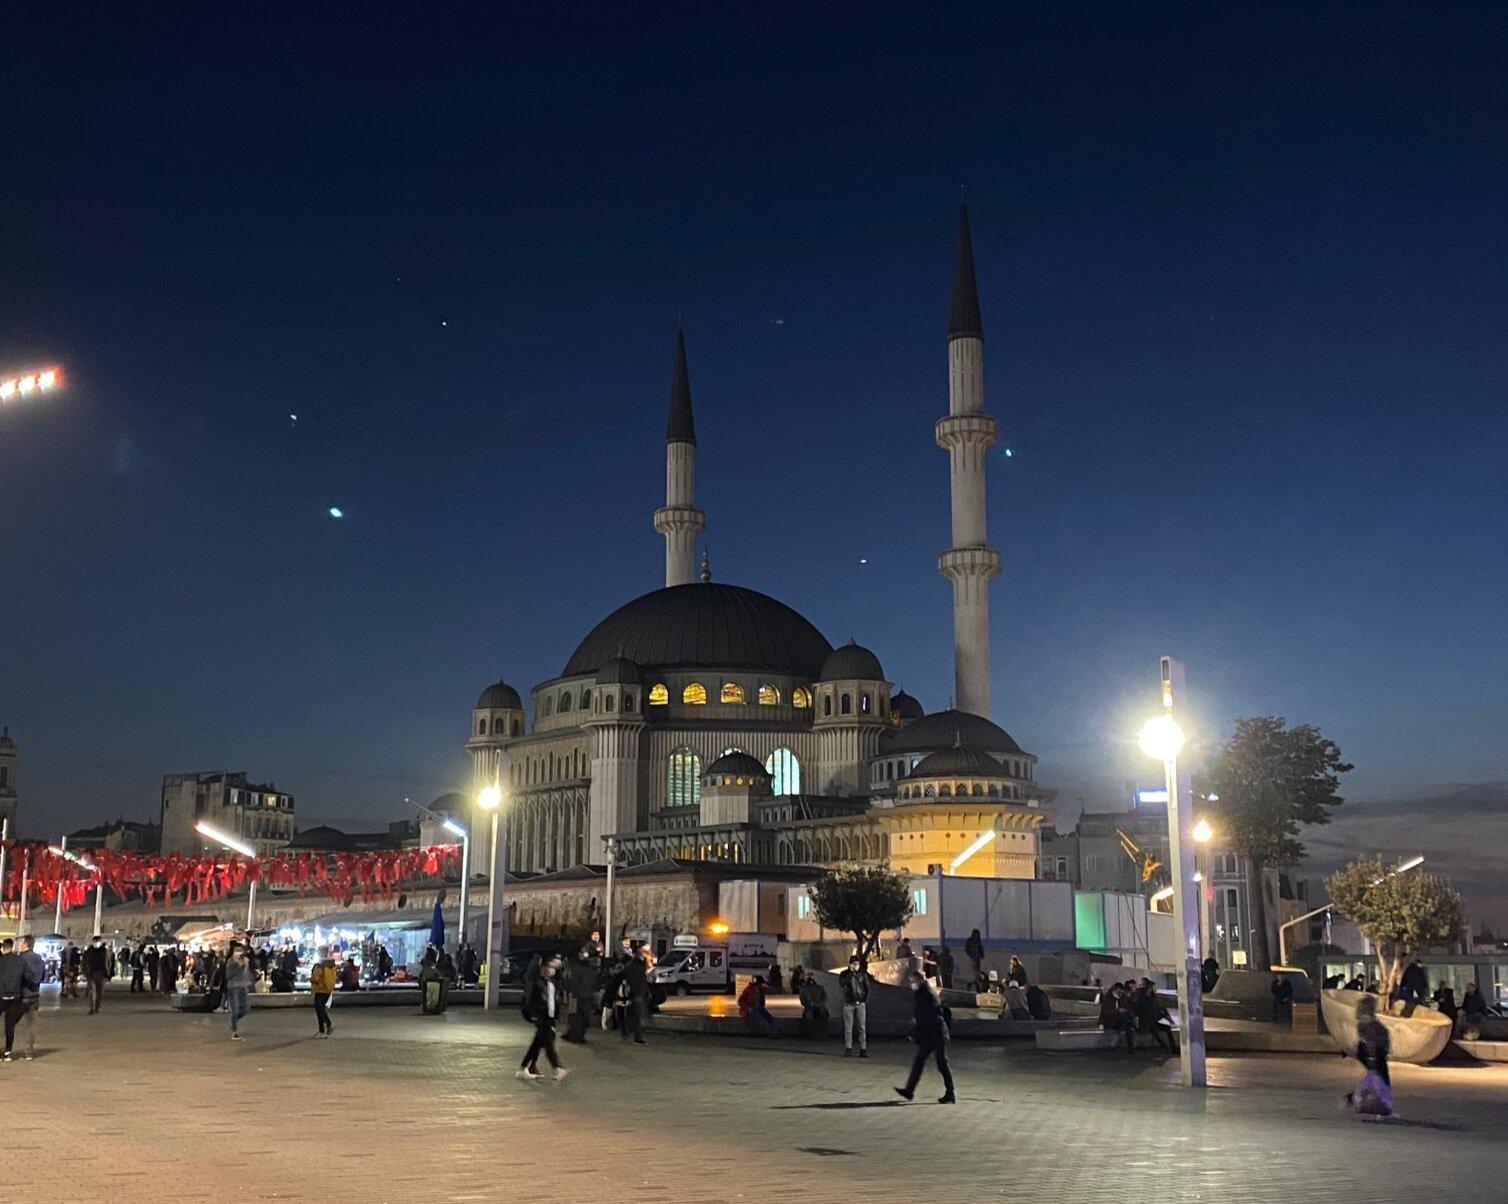 Мечеть рядом с метро Taksim. В Стамбуле таких много